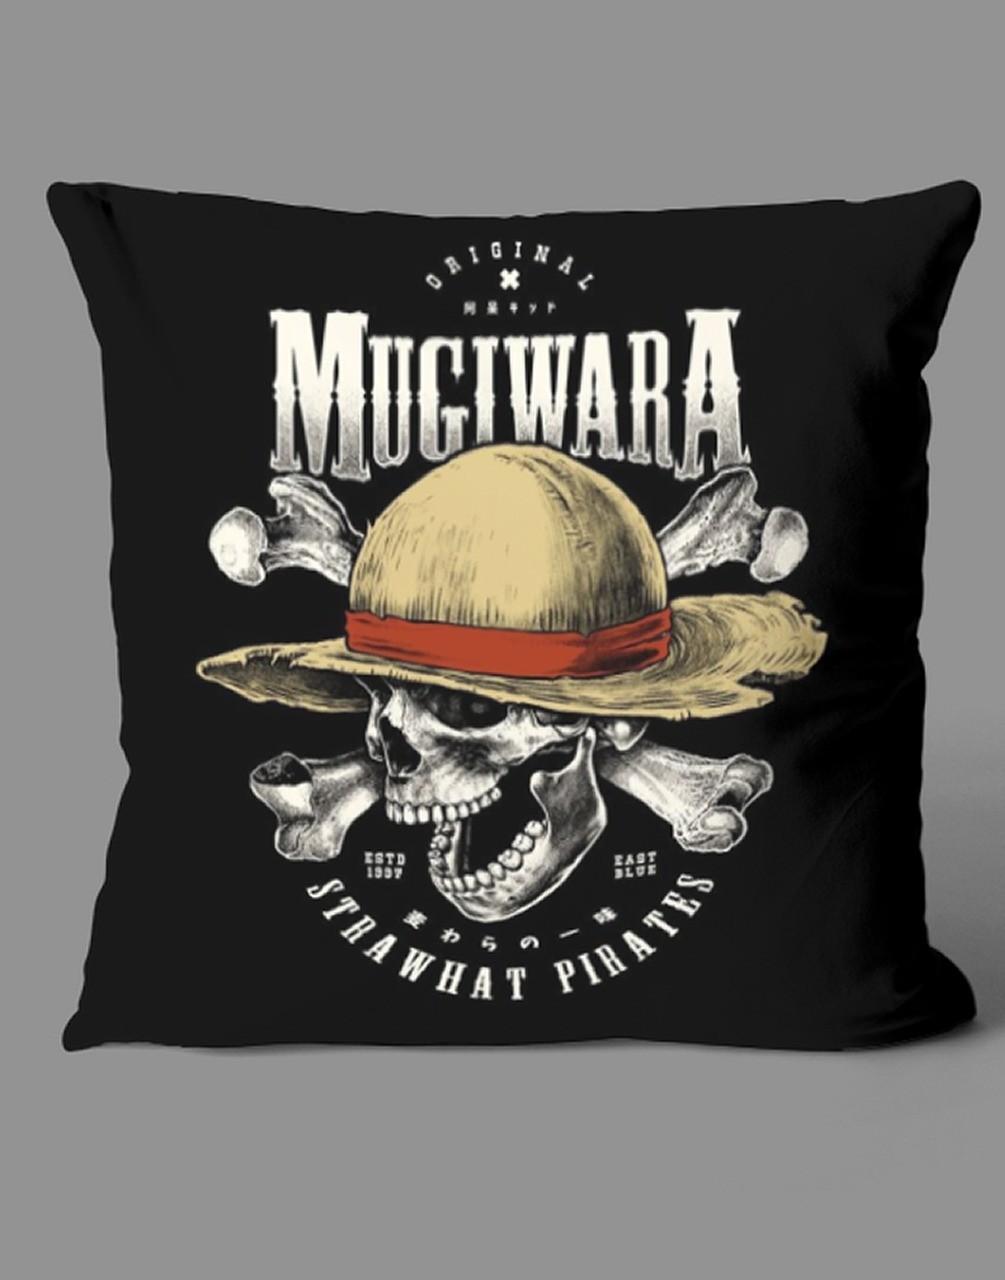 Almofada Mugiwara Strawhat Pirates Monkey D. Luffy: One Piece - EV